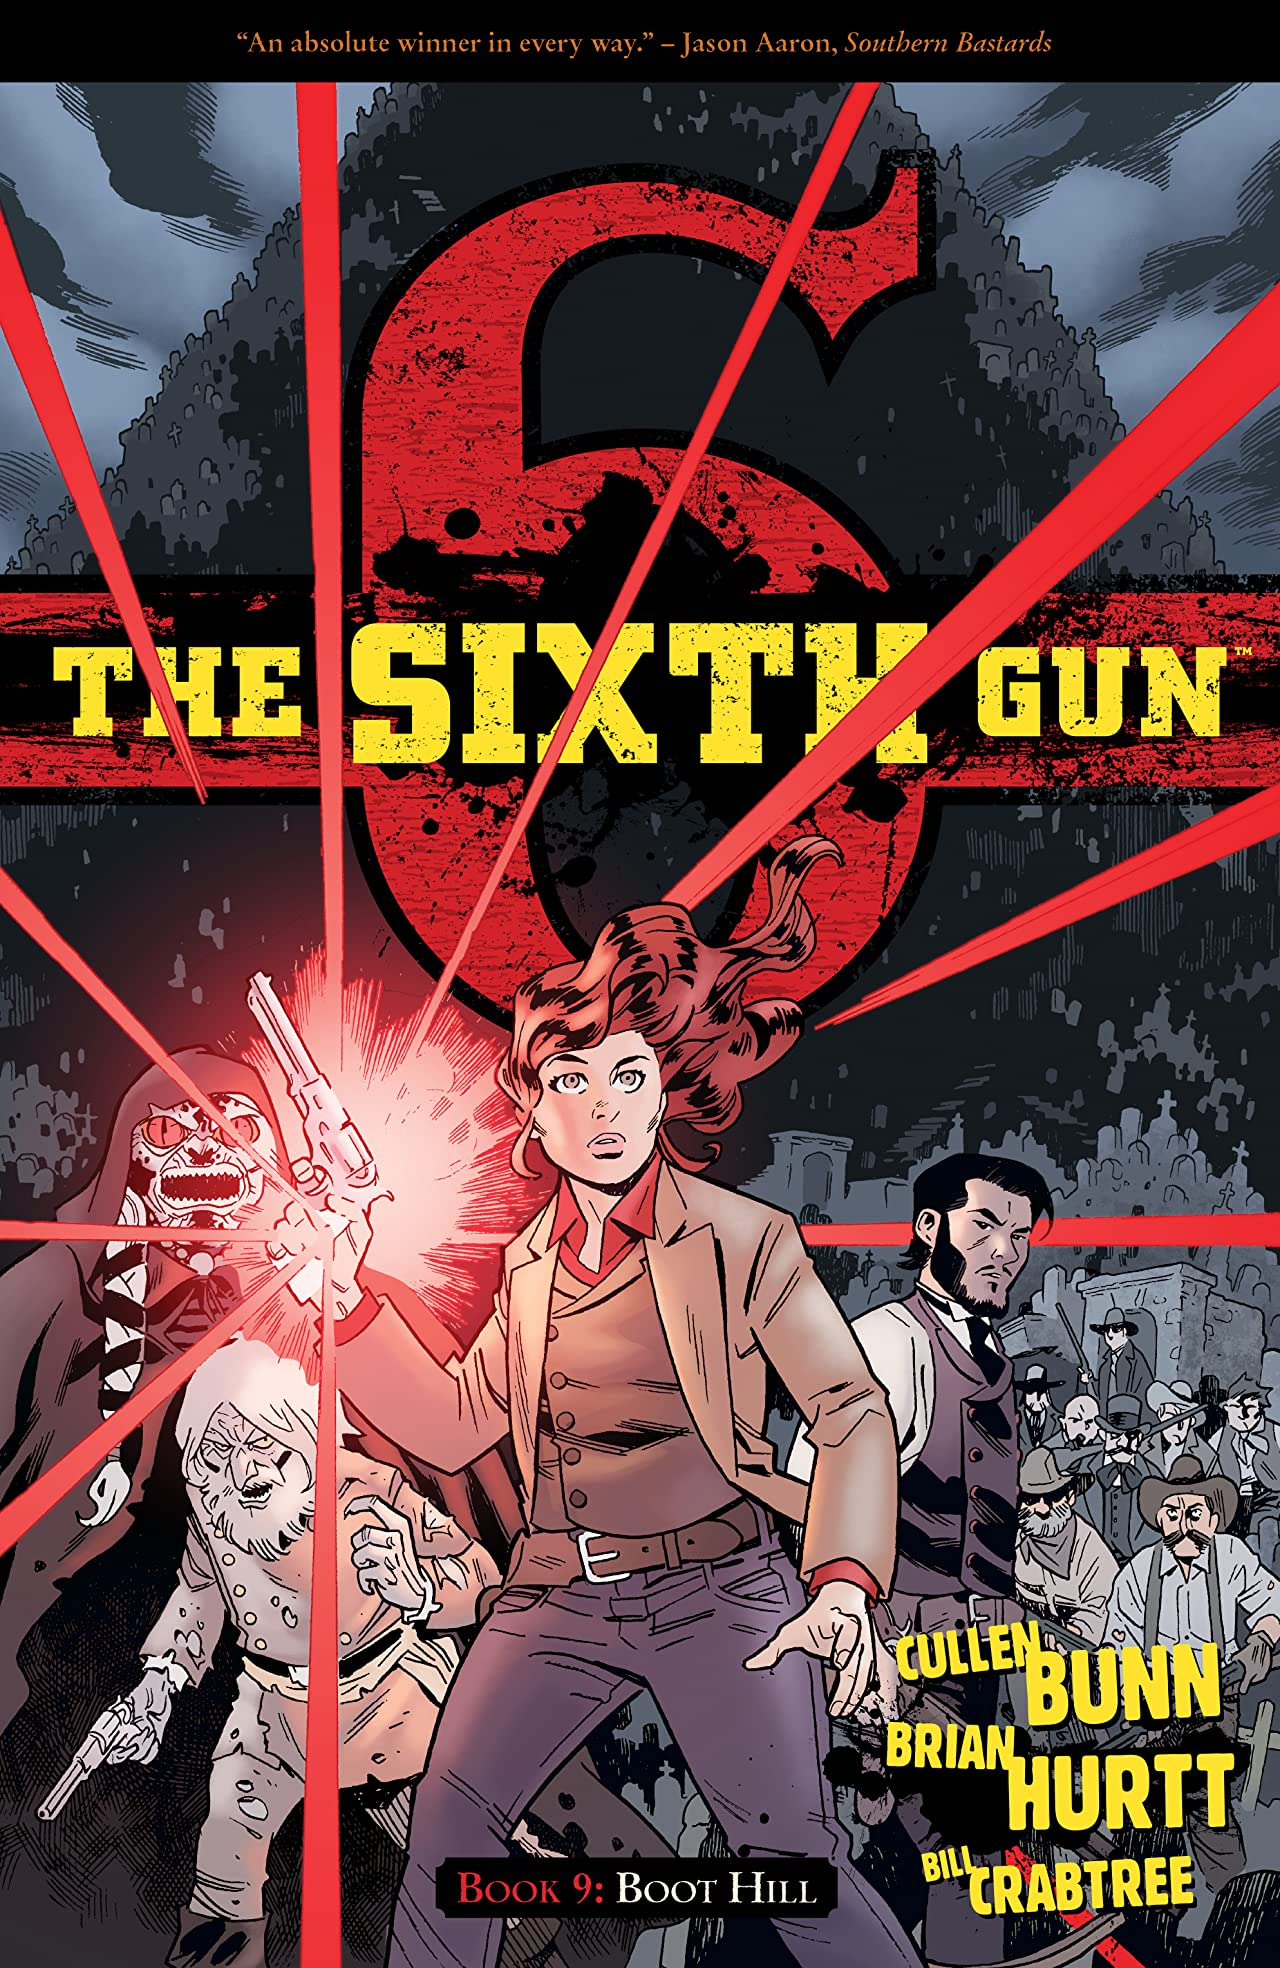 The Sixth Gun Vol. 9